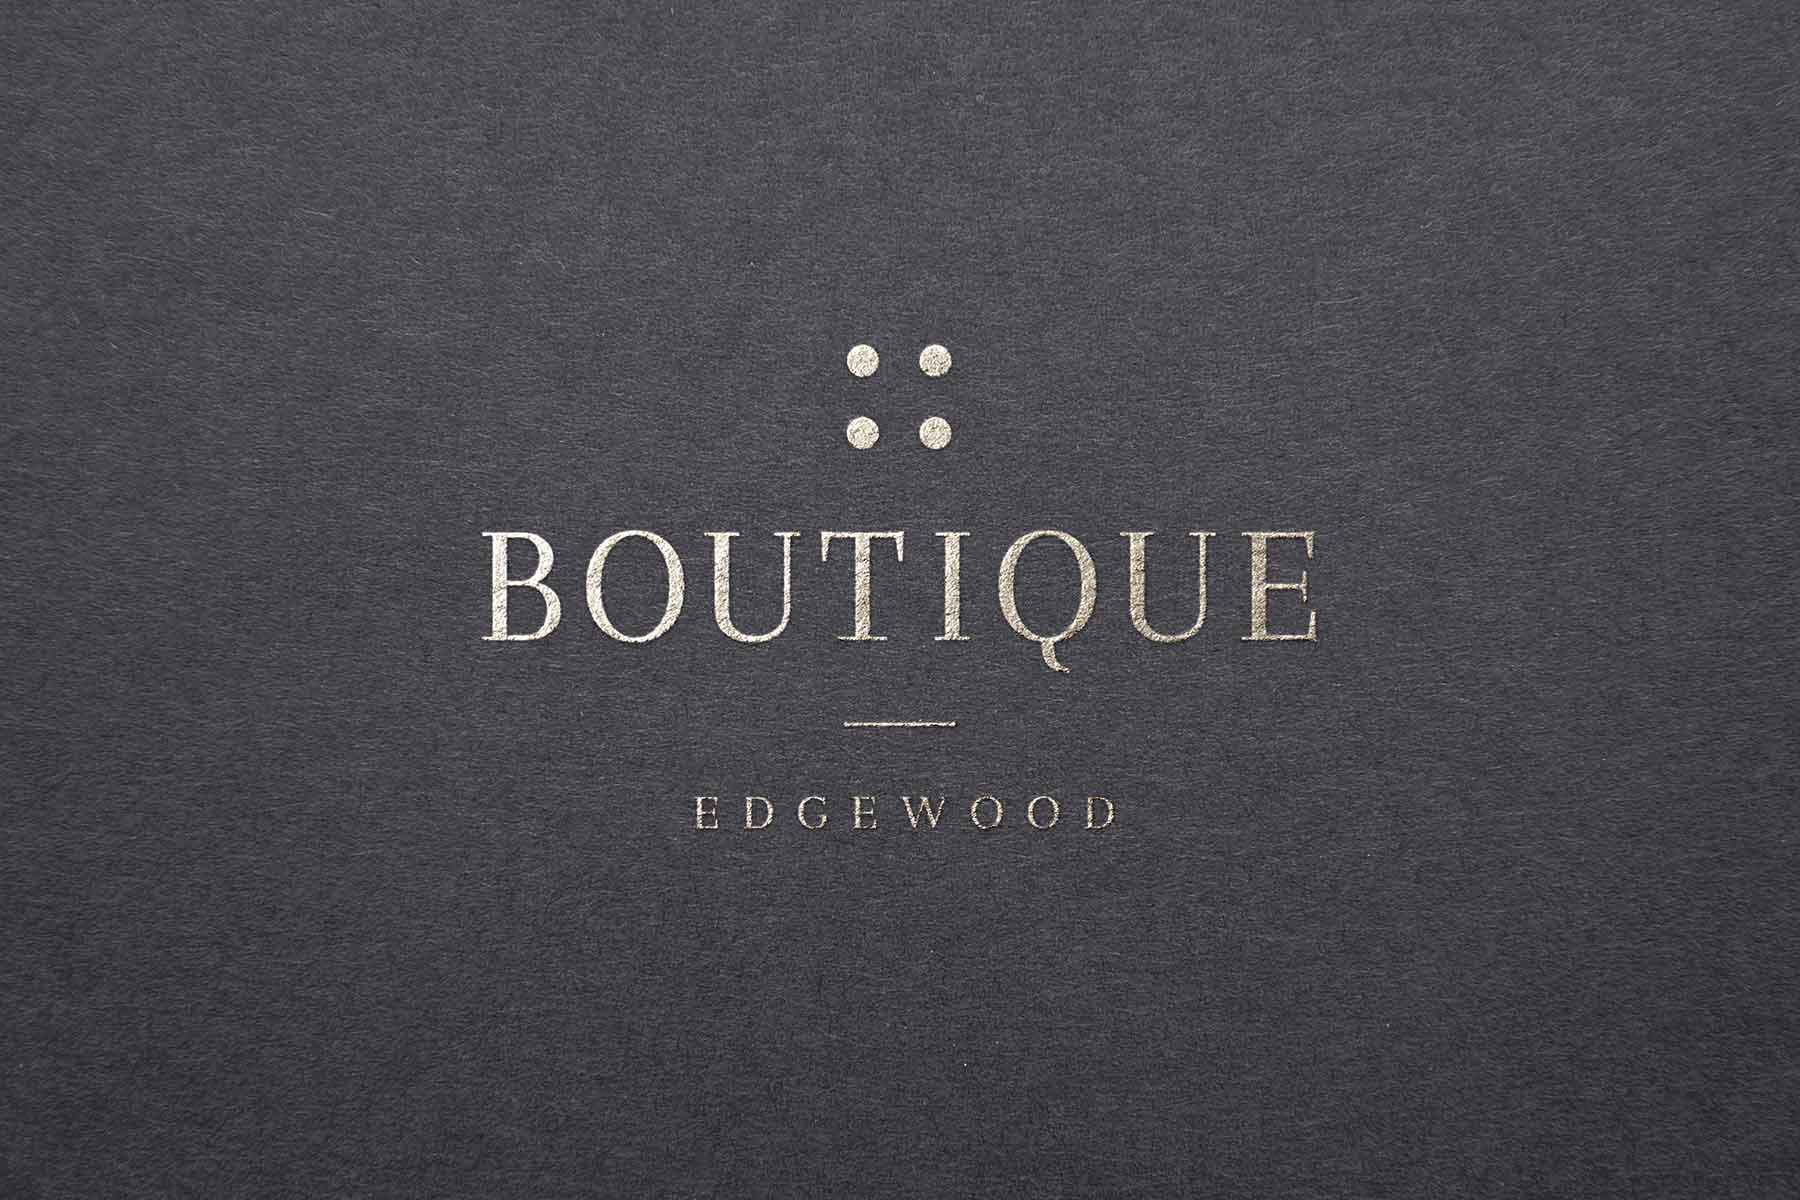 The Boutique Edgewood Tahoe branding